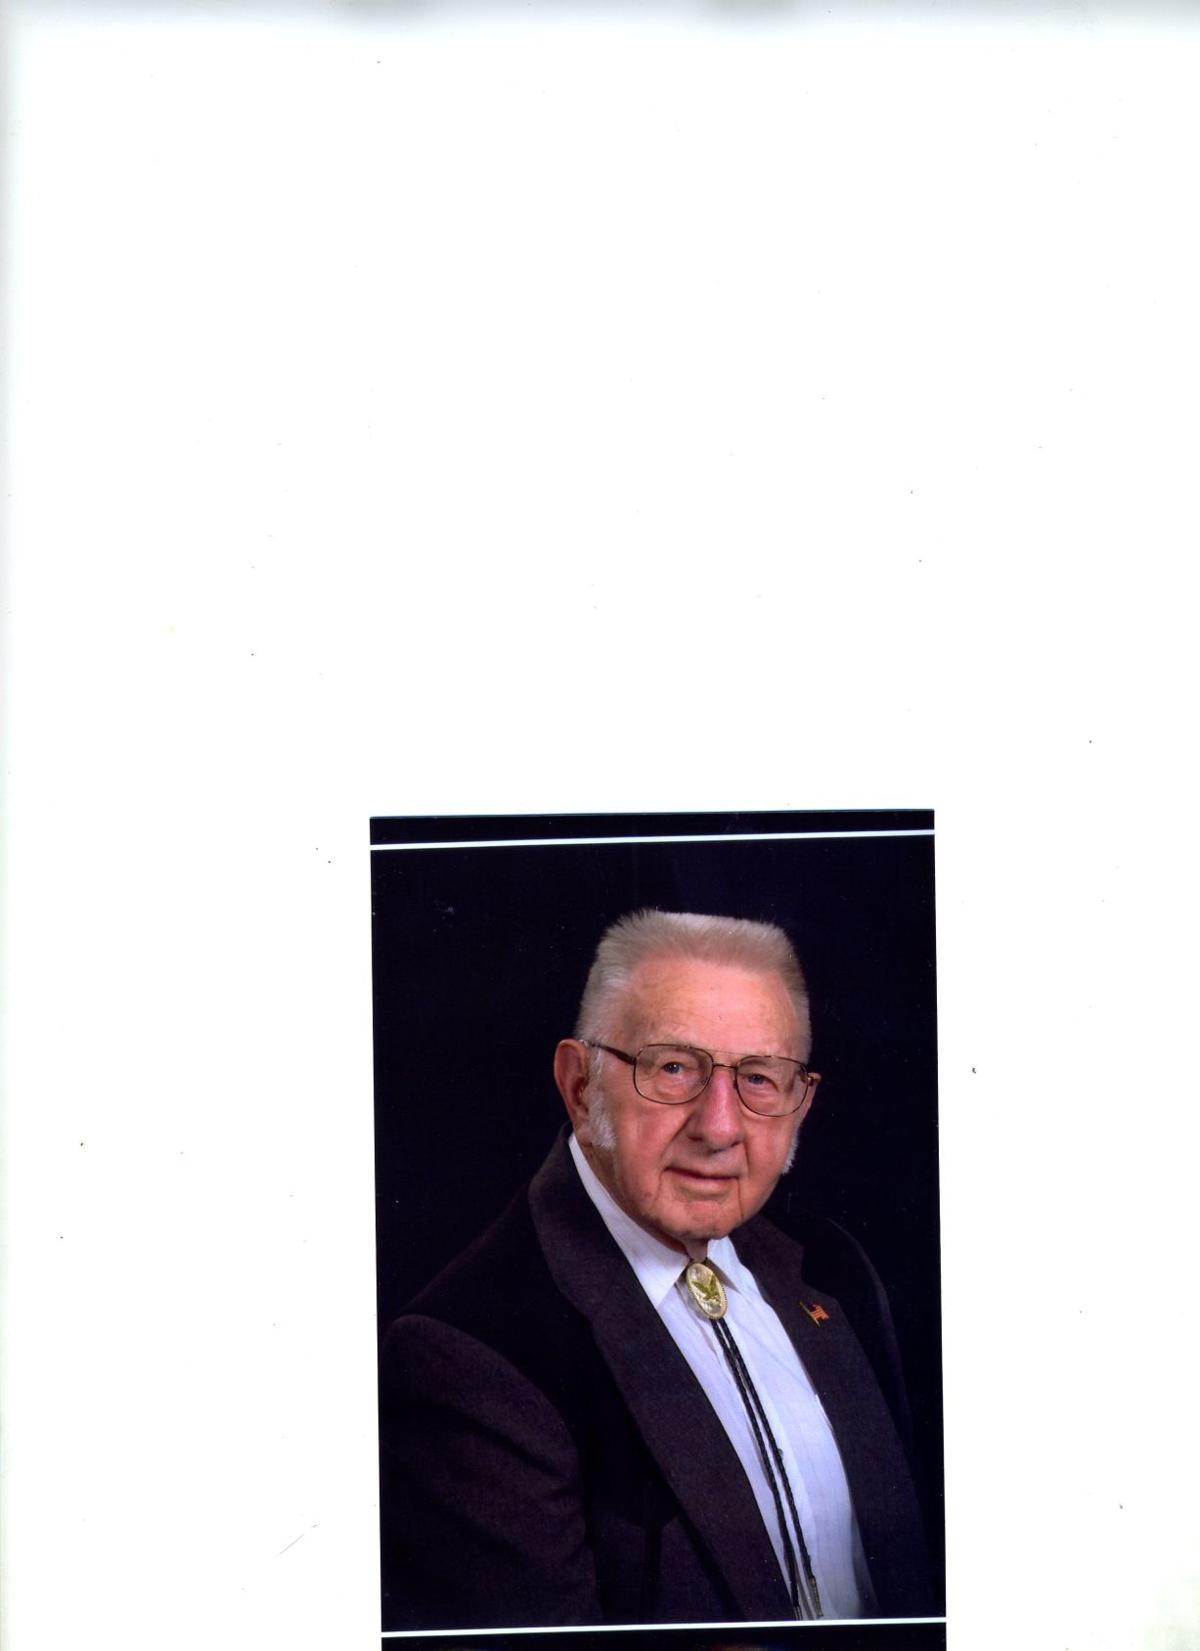 Bob Thomas Celebrates 93 Years!